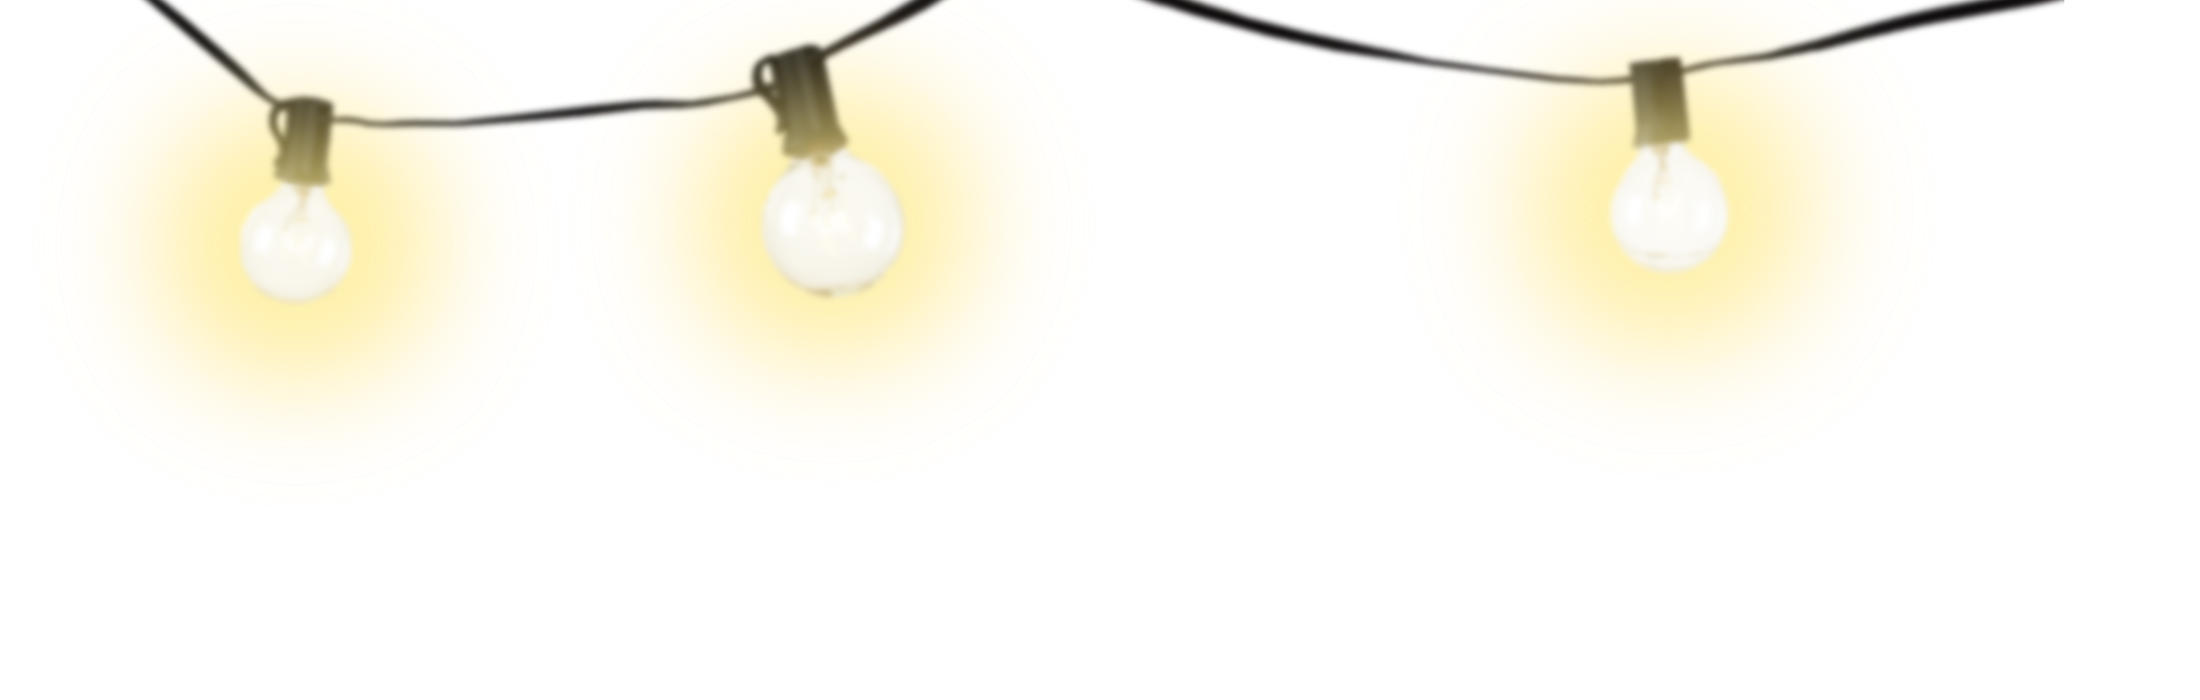 Christmas lights Lighting Incandescent light bulb Clip art.